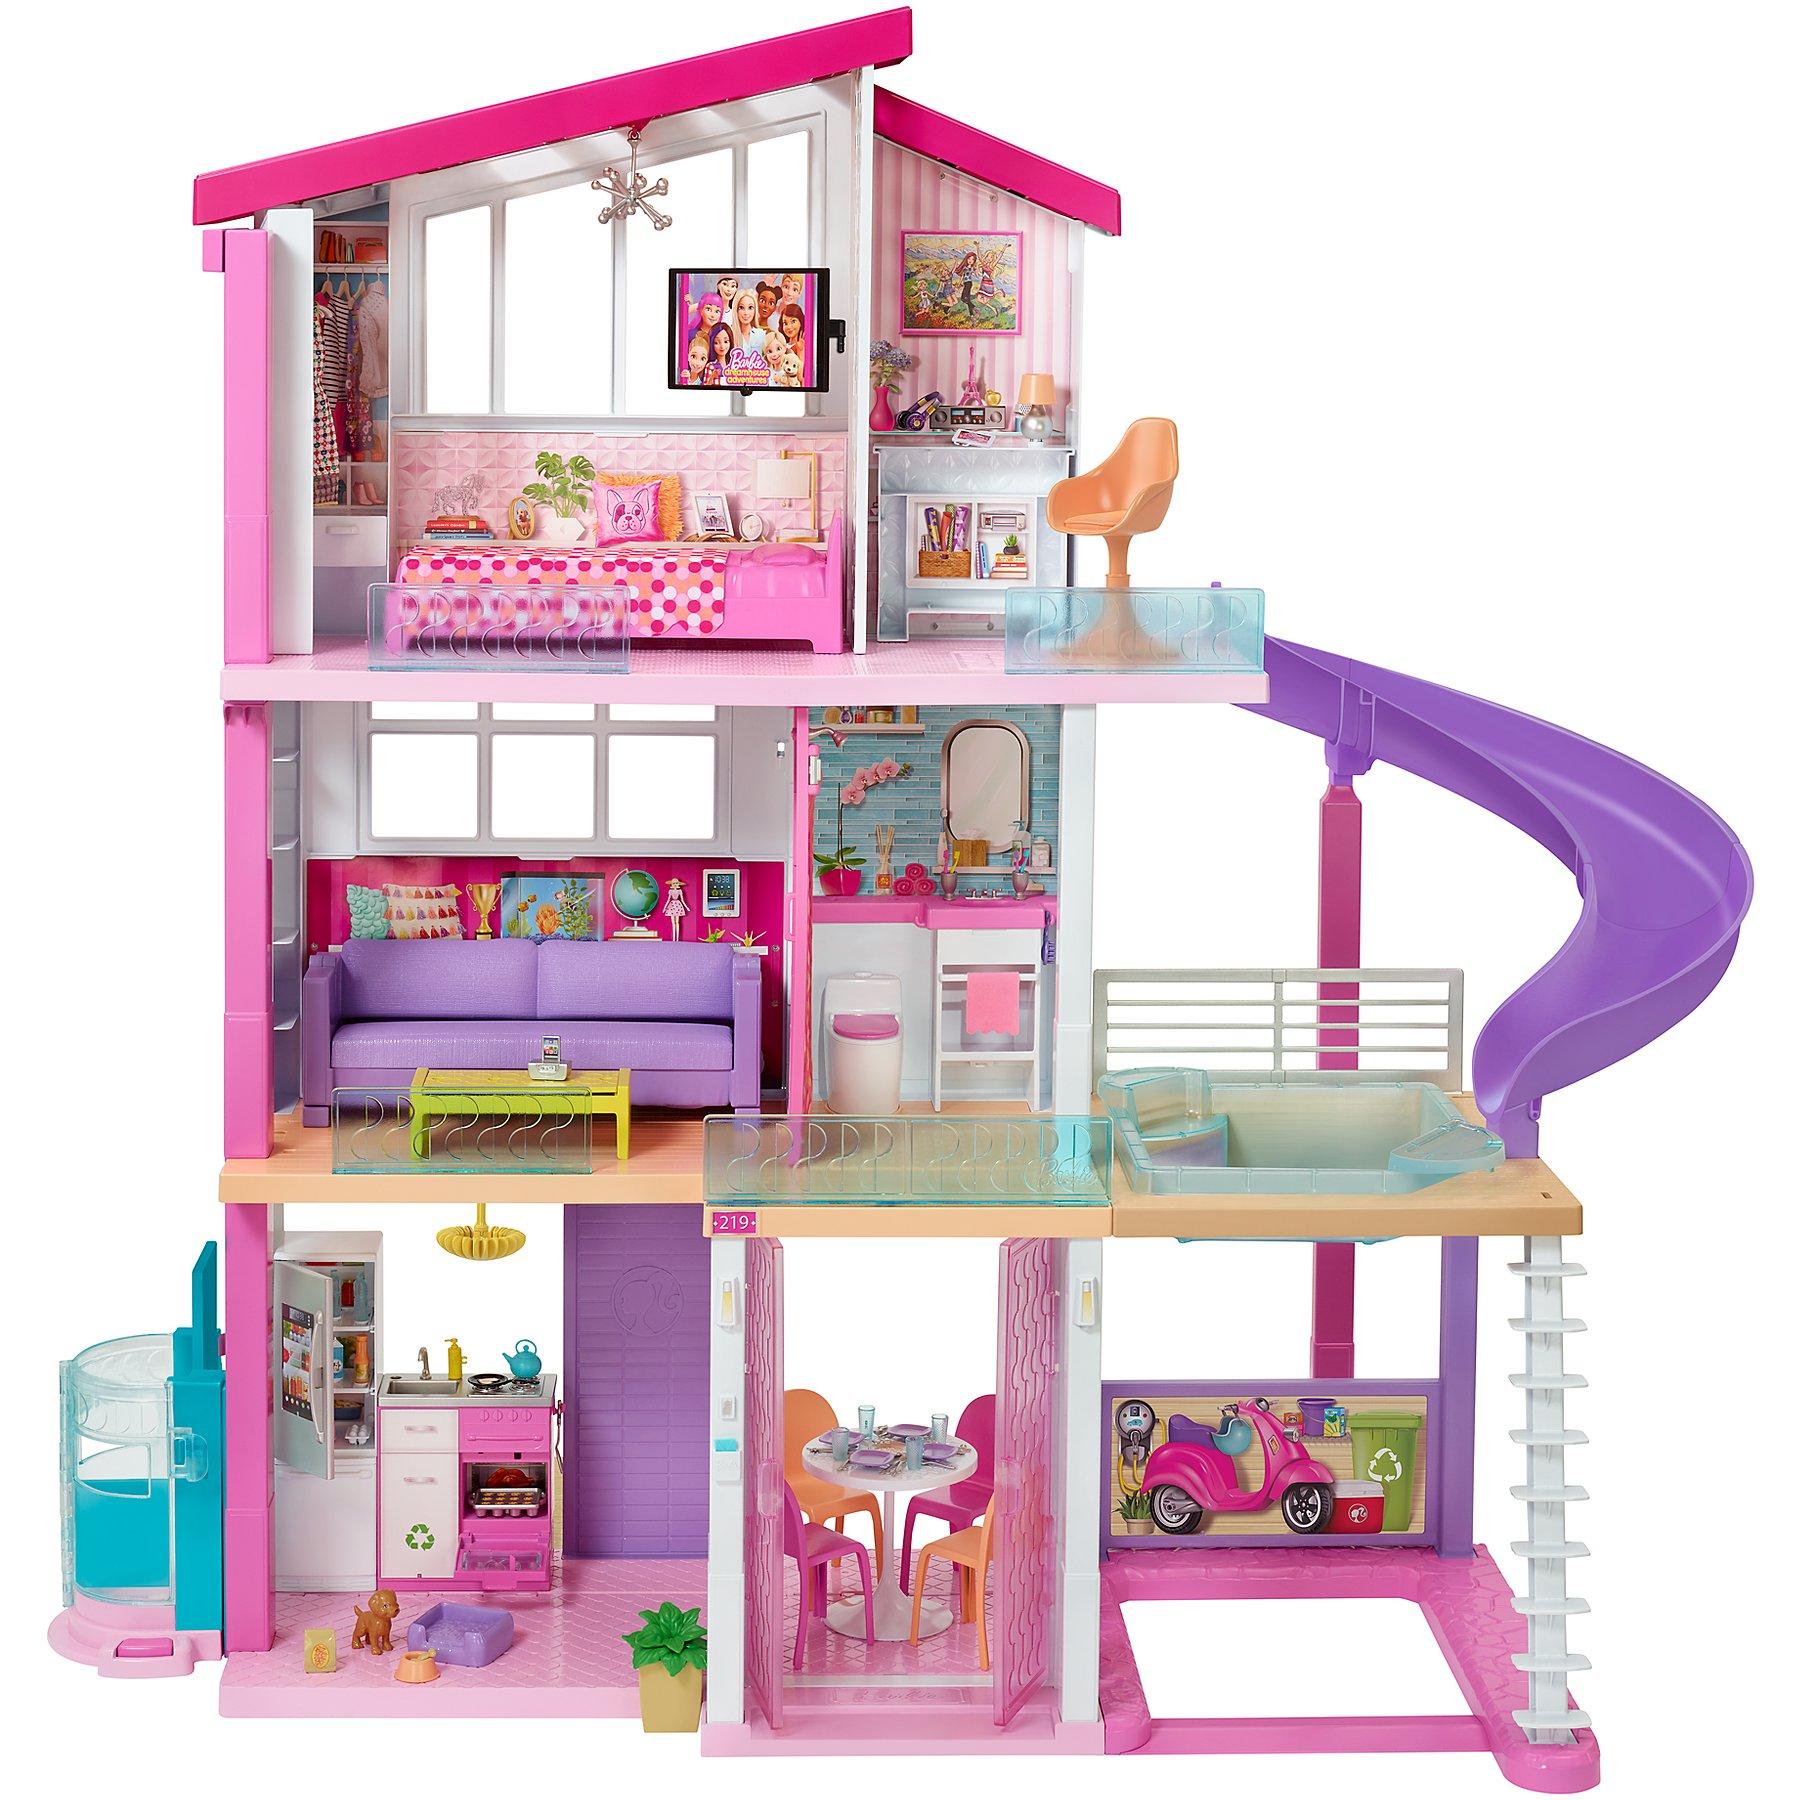 Bathroom//Bedroom//Garden//Kitchen// Furniture Play Set For Barbie Dollhouse Toy